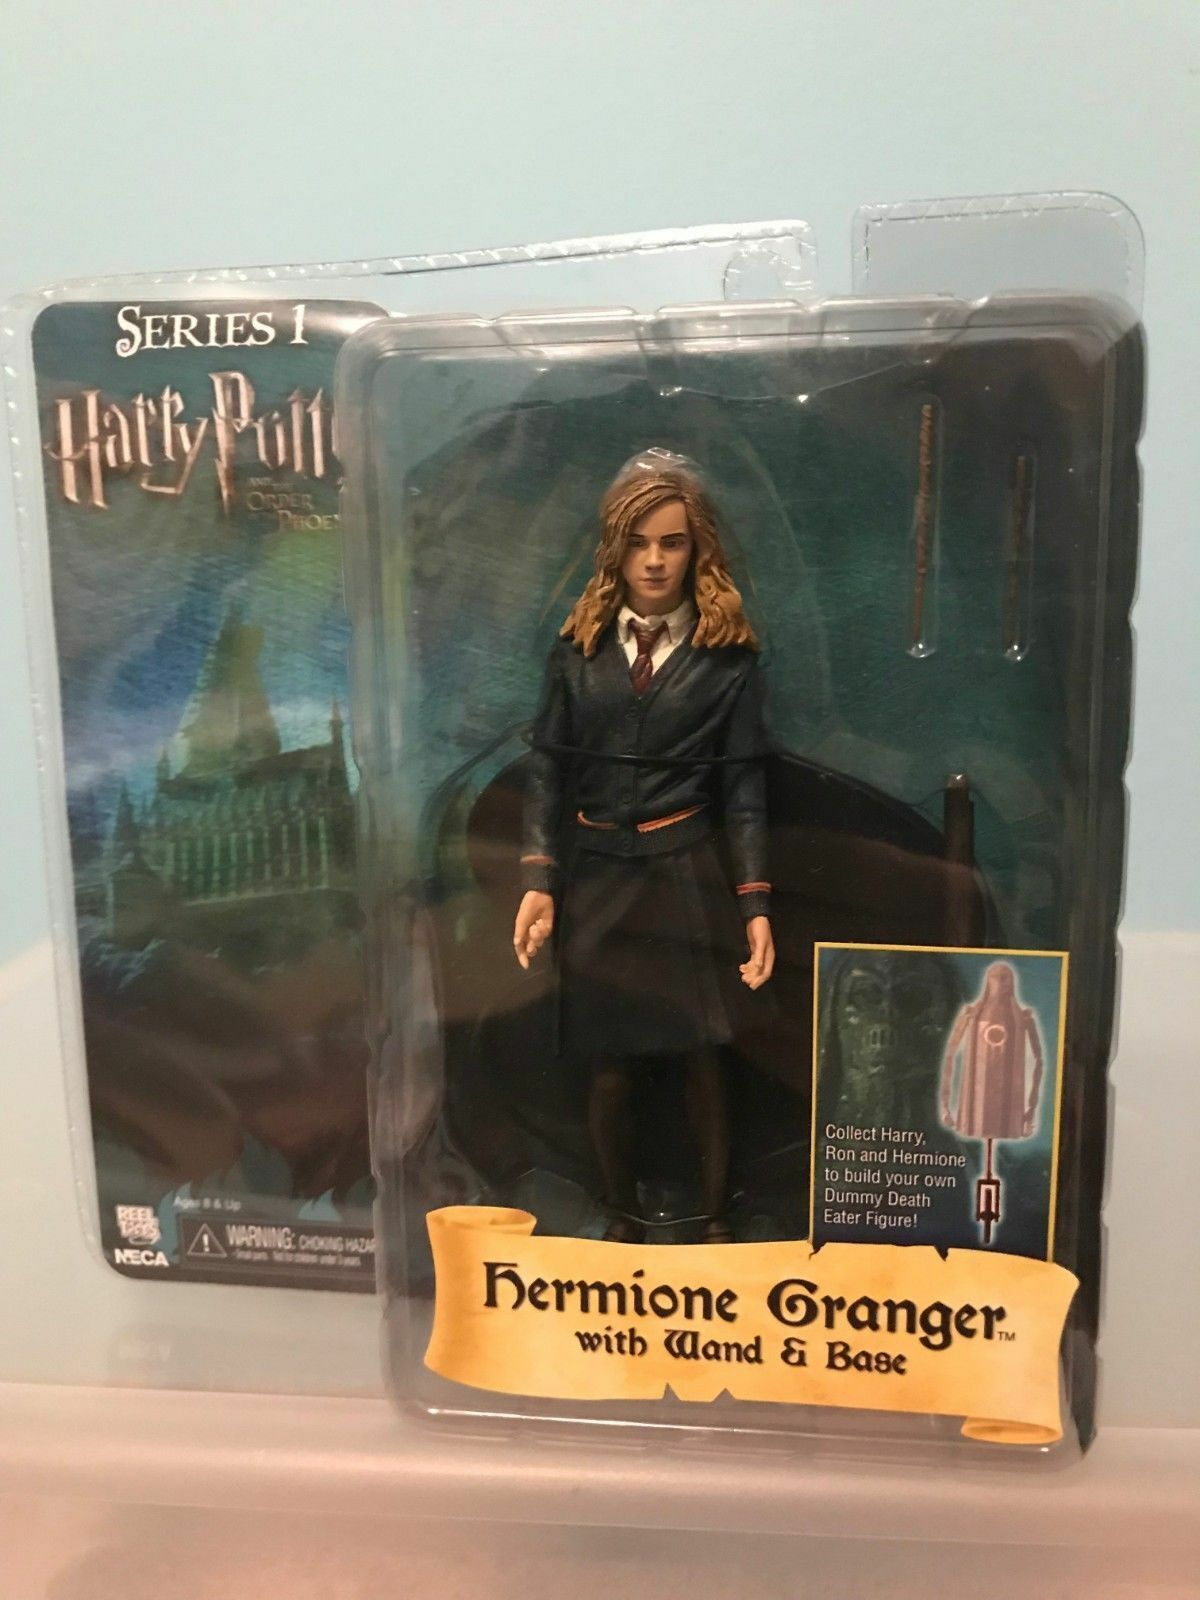 Harry Potter de la serie 1 Hermione Granger, la rara Fénix.